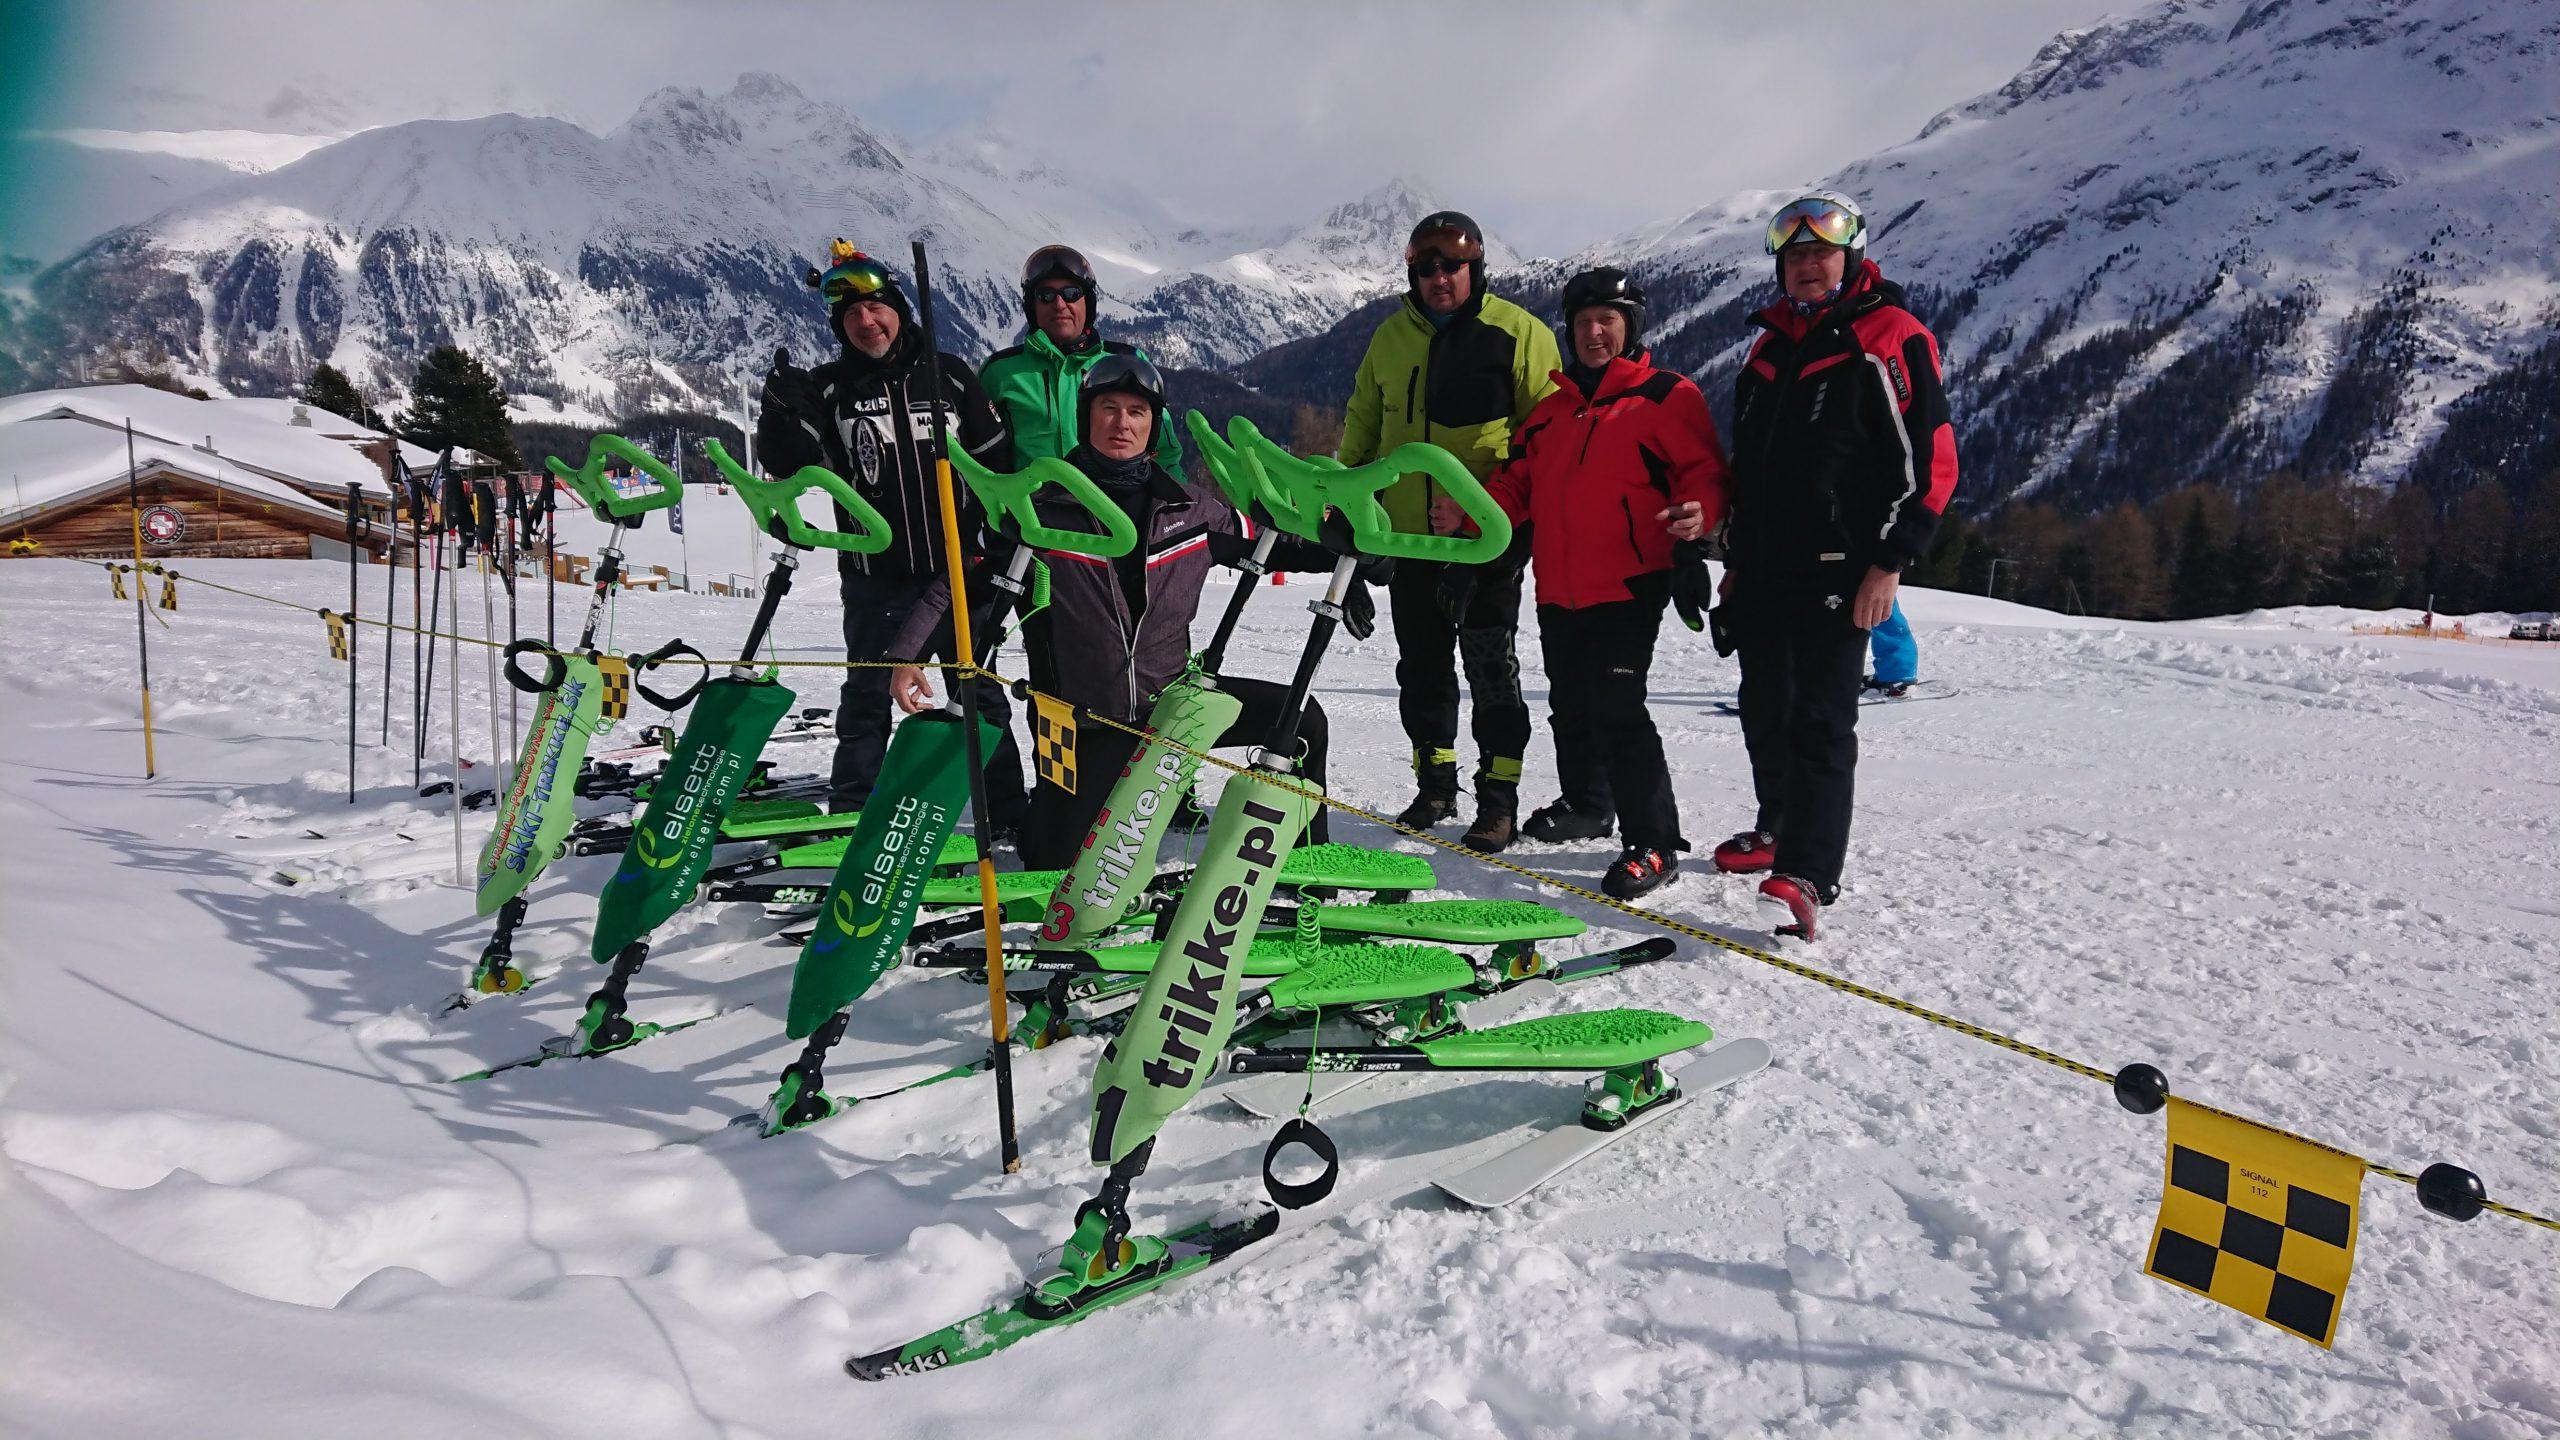 Fun, ride, smile. Skki Trikke. Sankt Moritz, Switzerland.